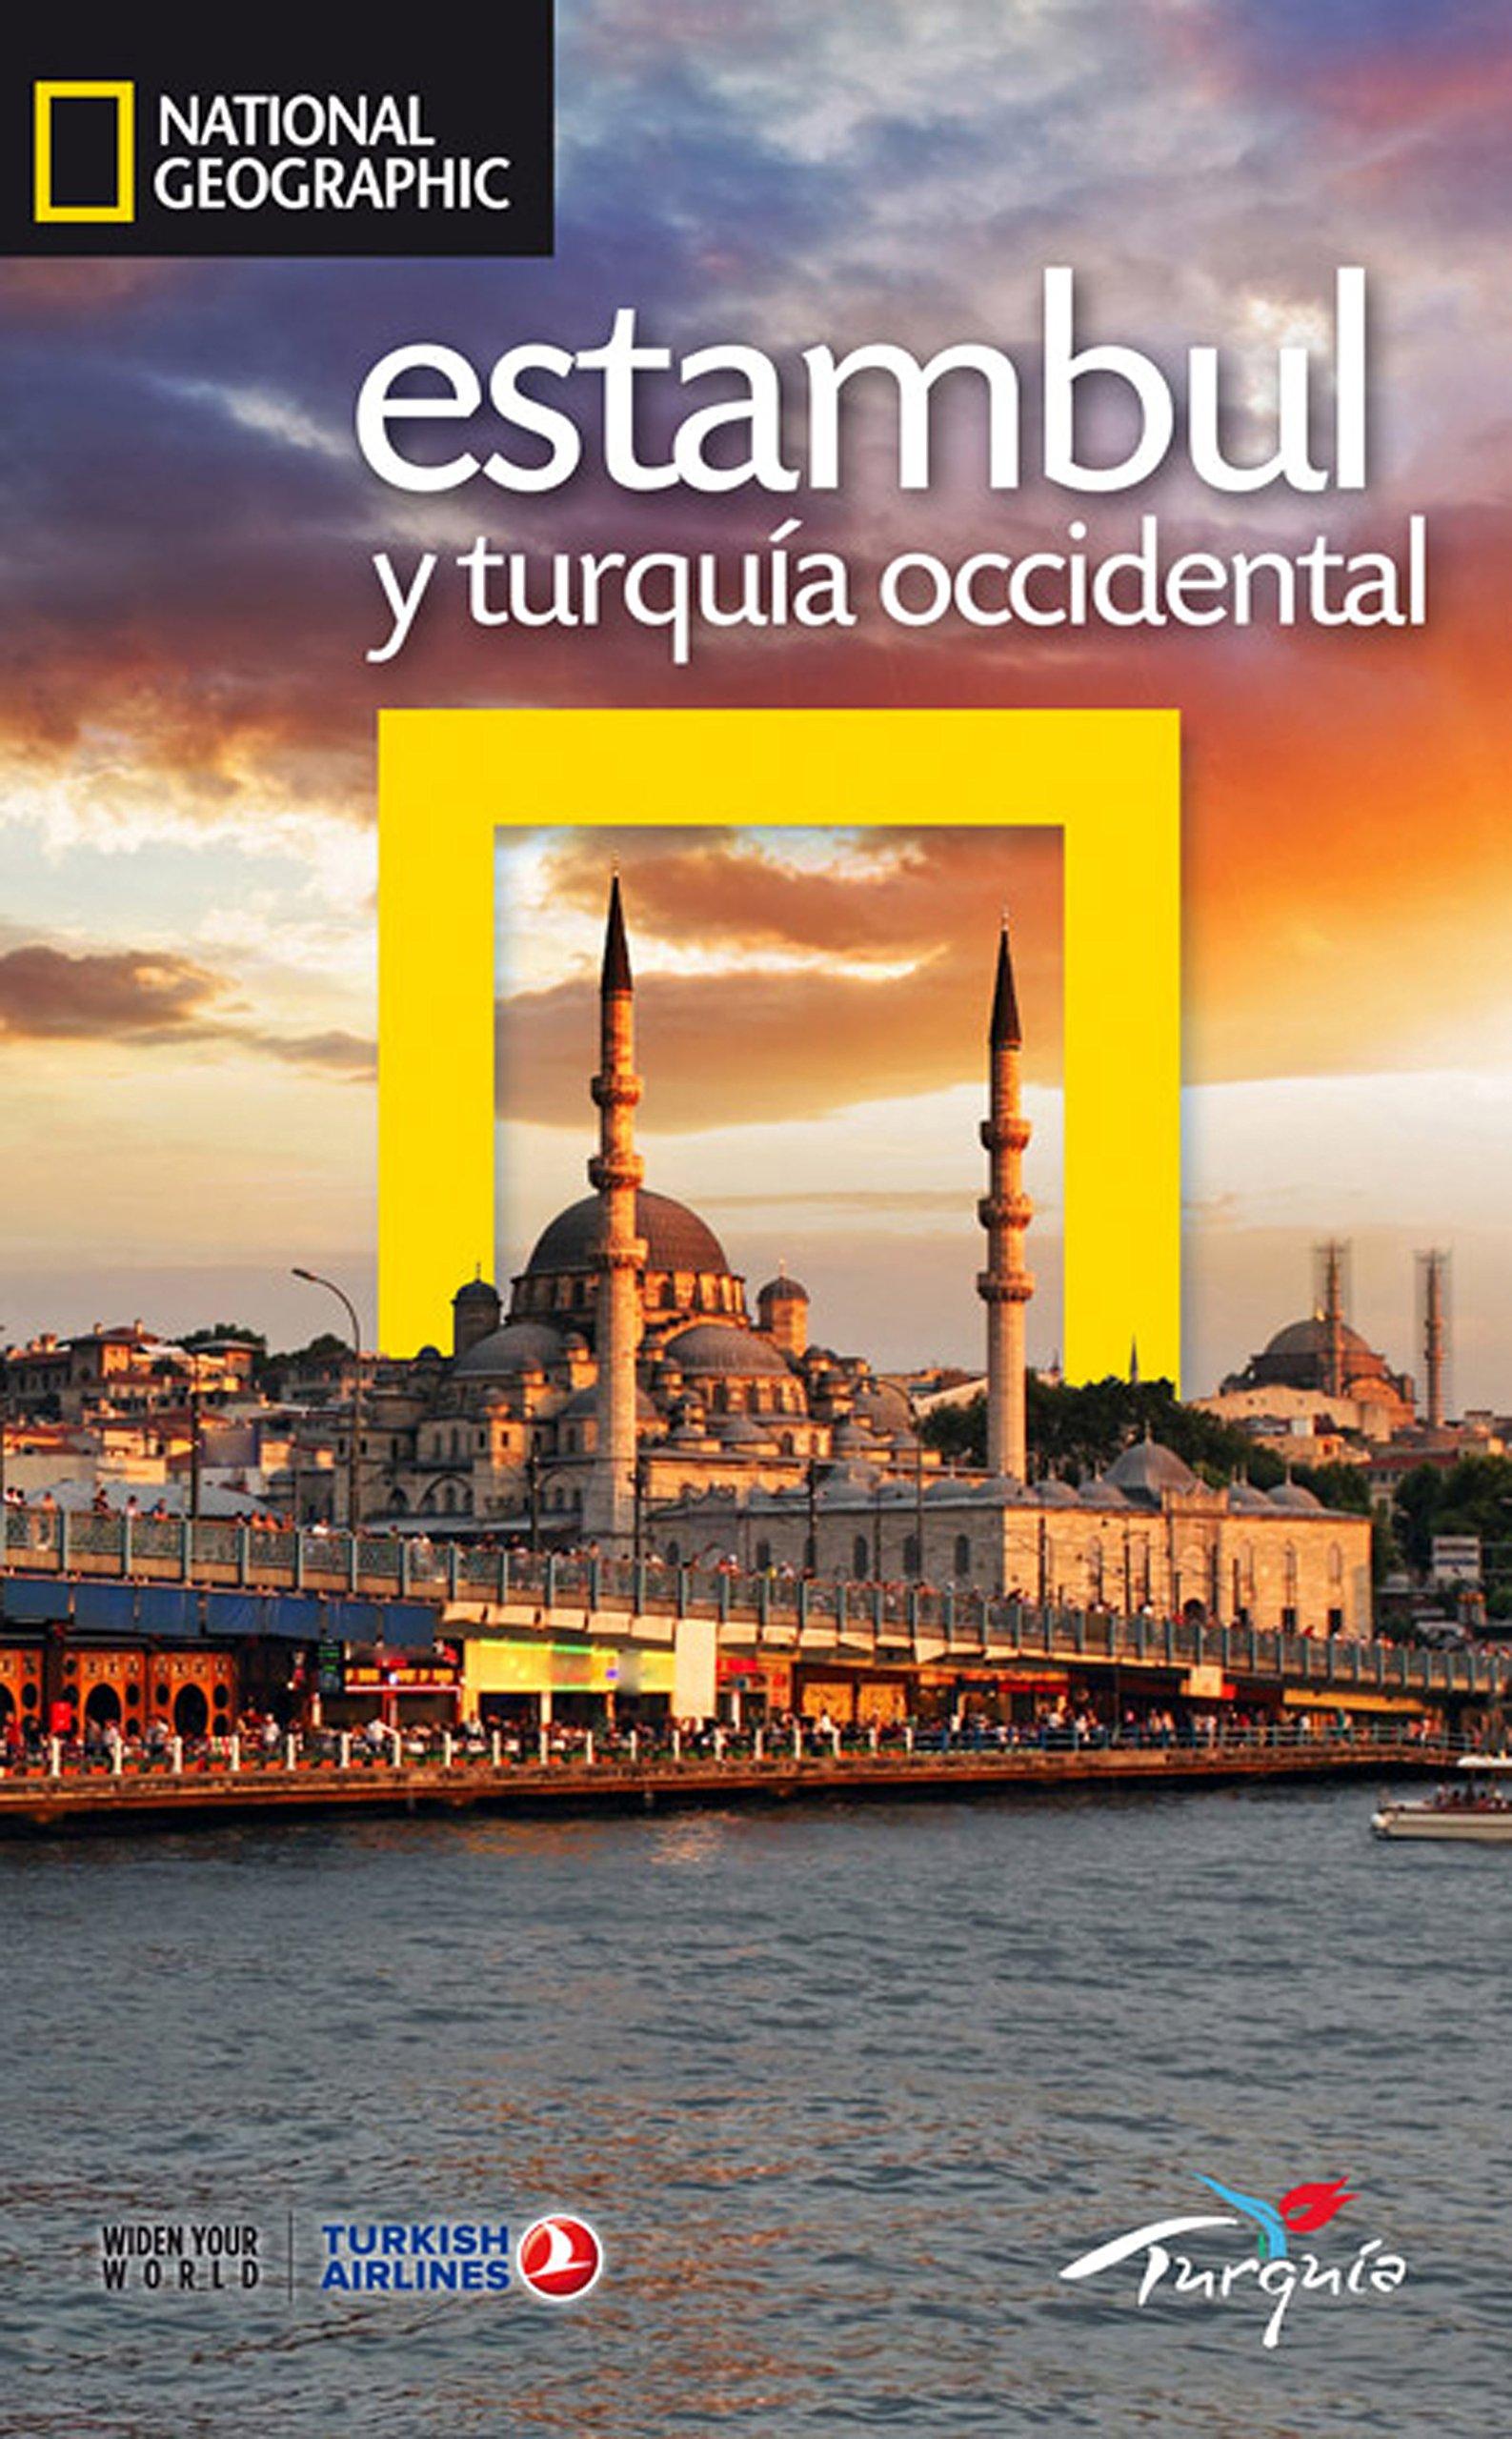 Guía de viaje National Geographic: Estambul y Turquía Occidental (GUIAS) Tapa blanda – 5 may 2016 NATIONAL GEOGRAPHIC 8482986333 Travel & holiday guides Reiseführer: Abenteuerurlaub